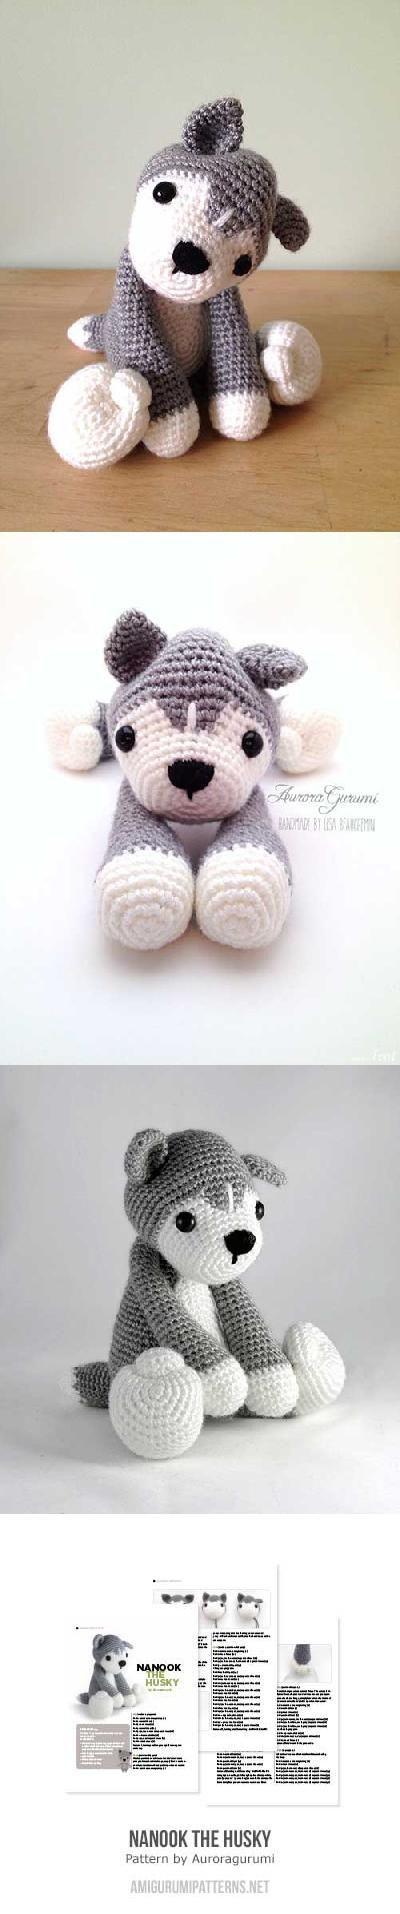 Nanook the husky amigurumi pattern by AuroraGurumi | Patrones ...